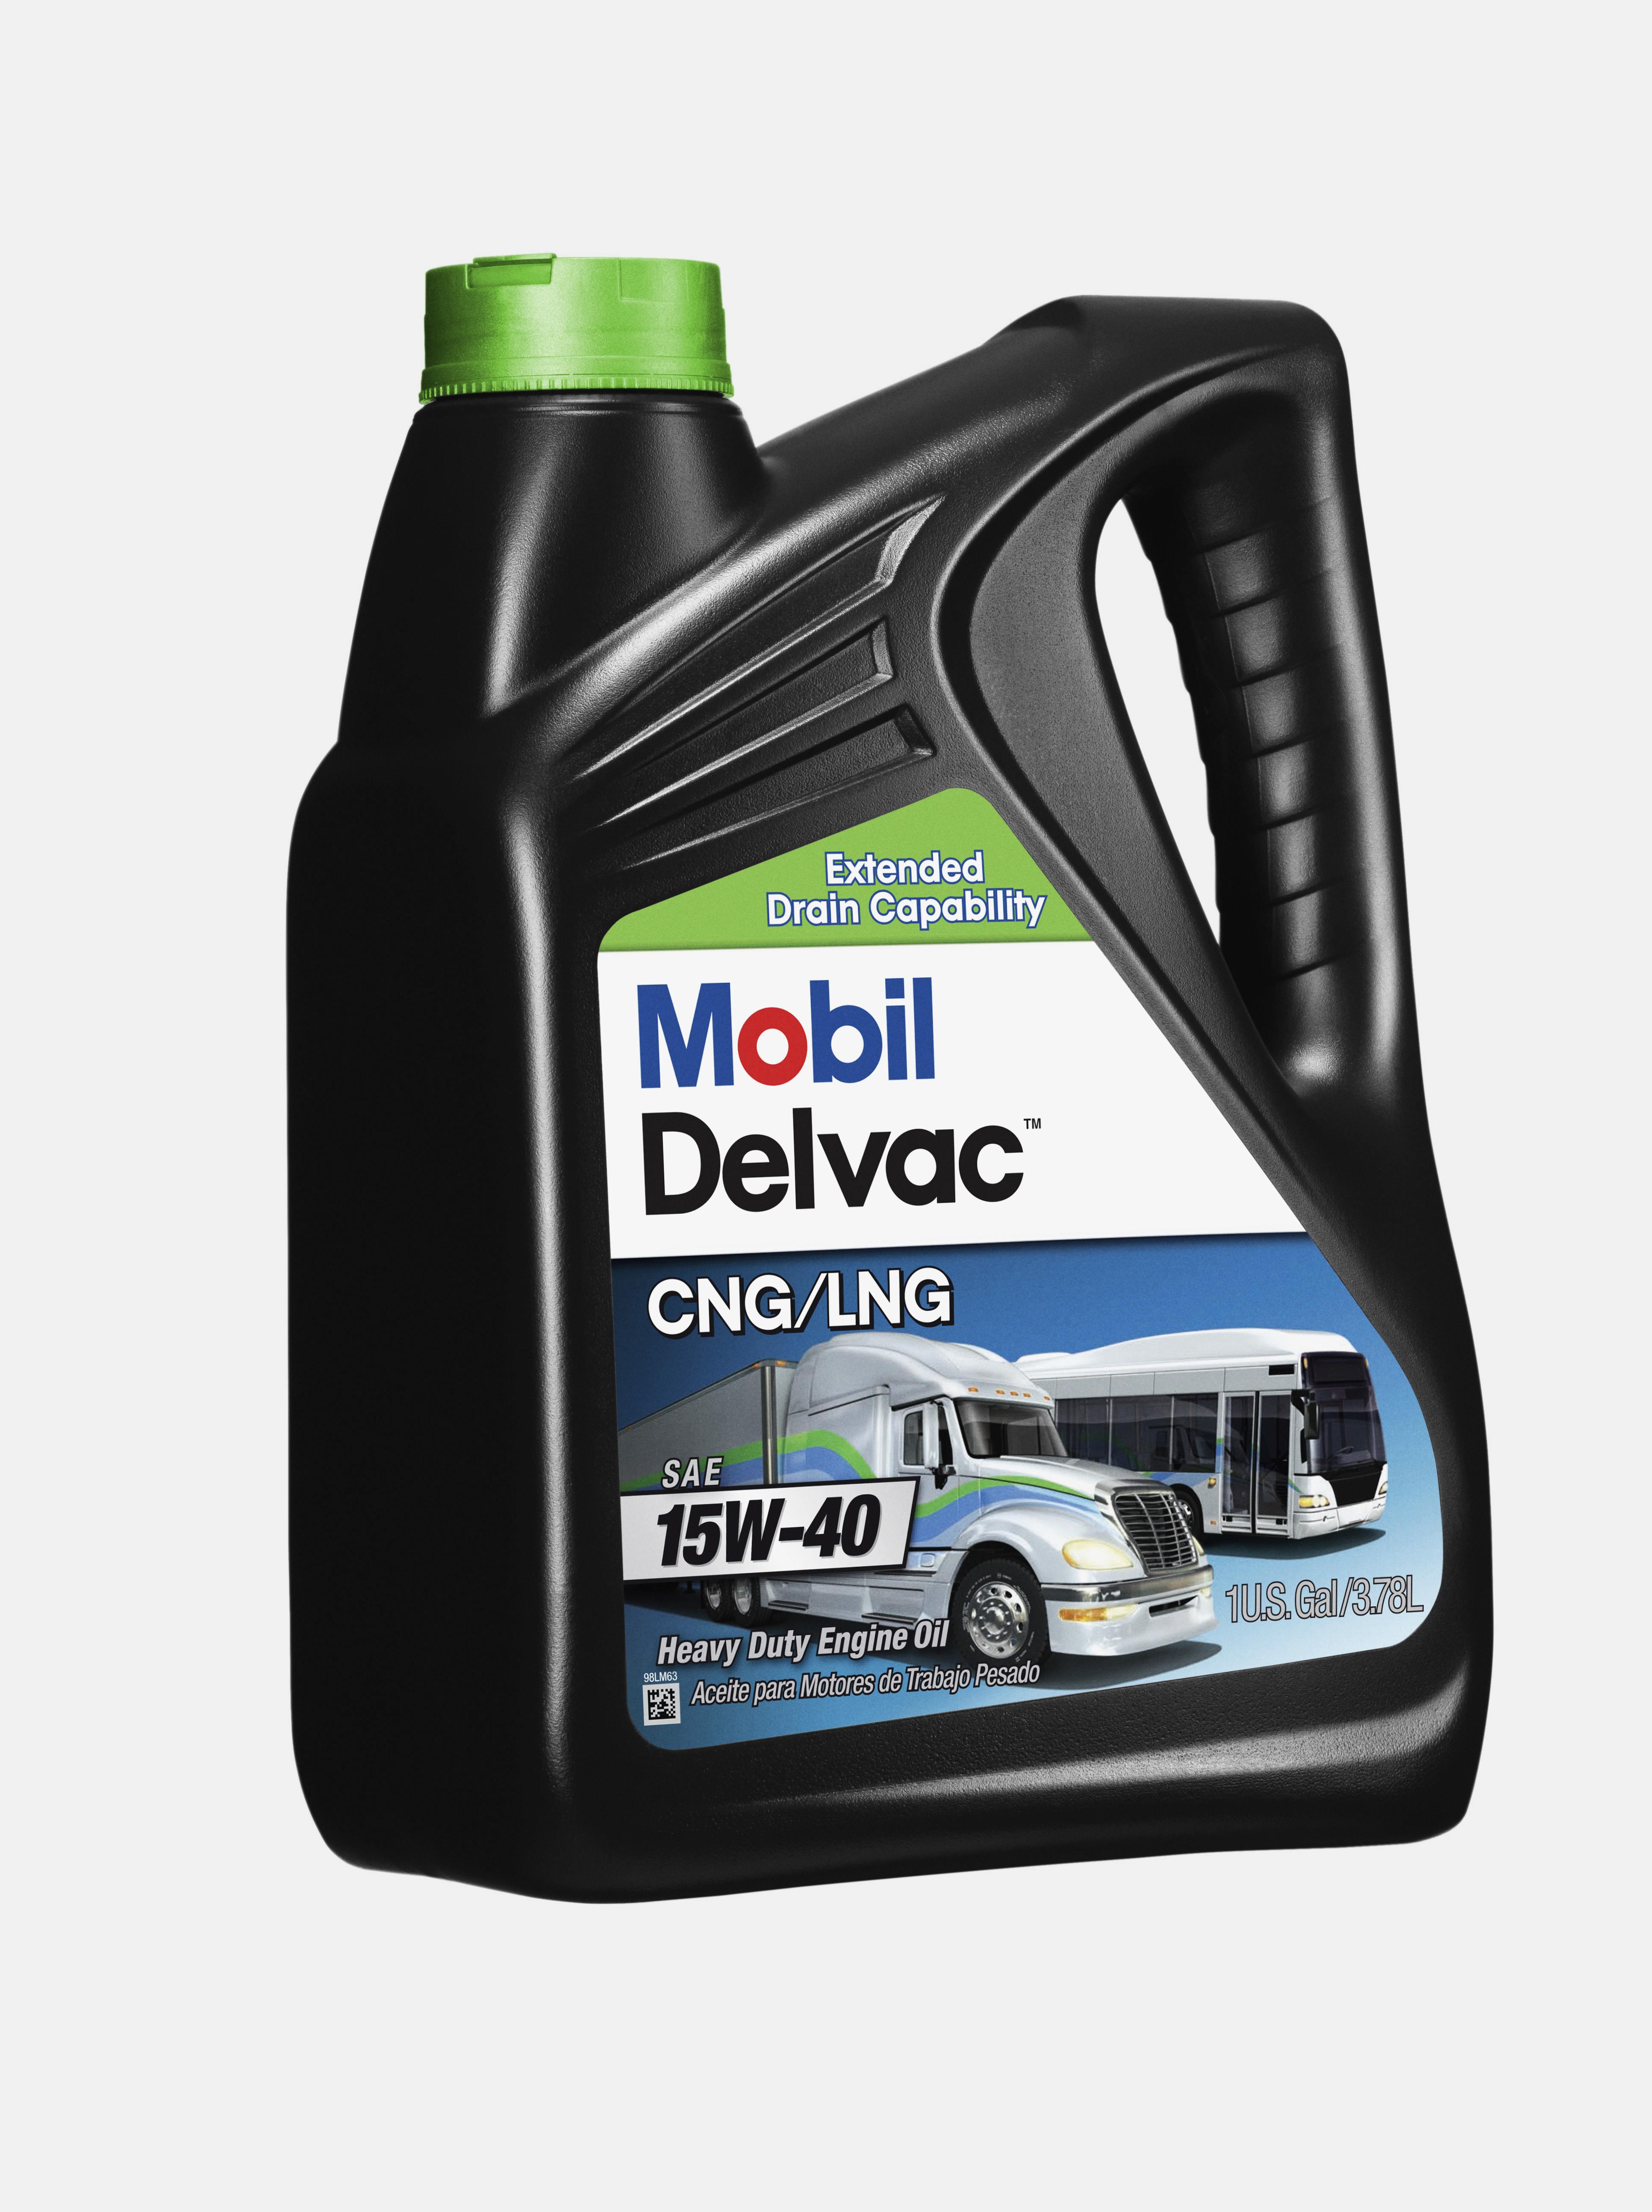 Compressed Natural Gas Engine Oil